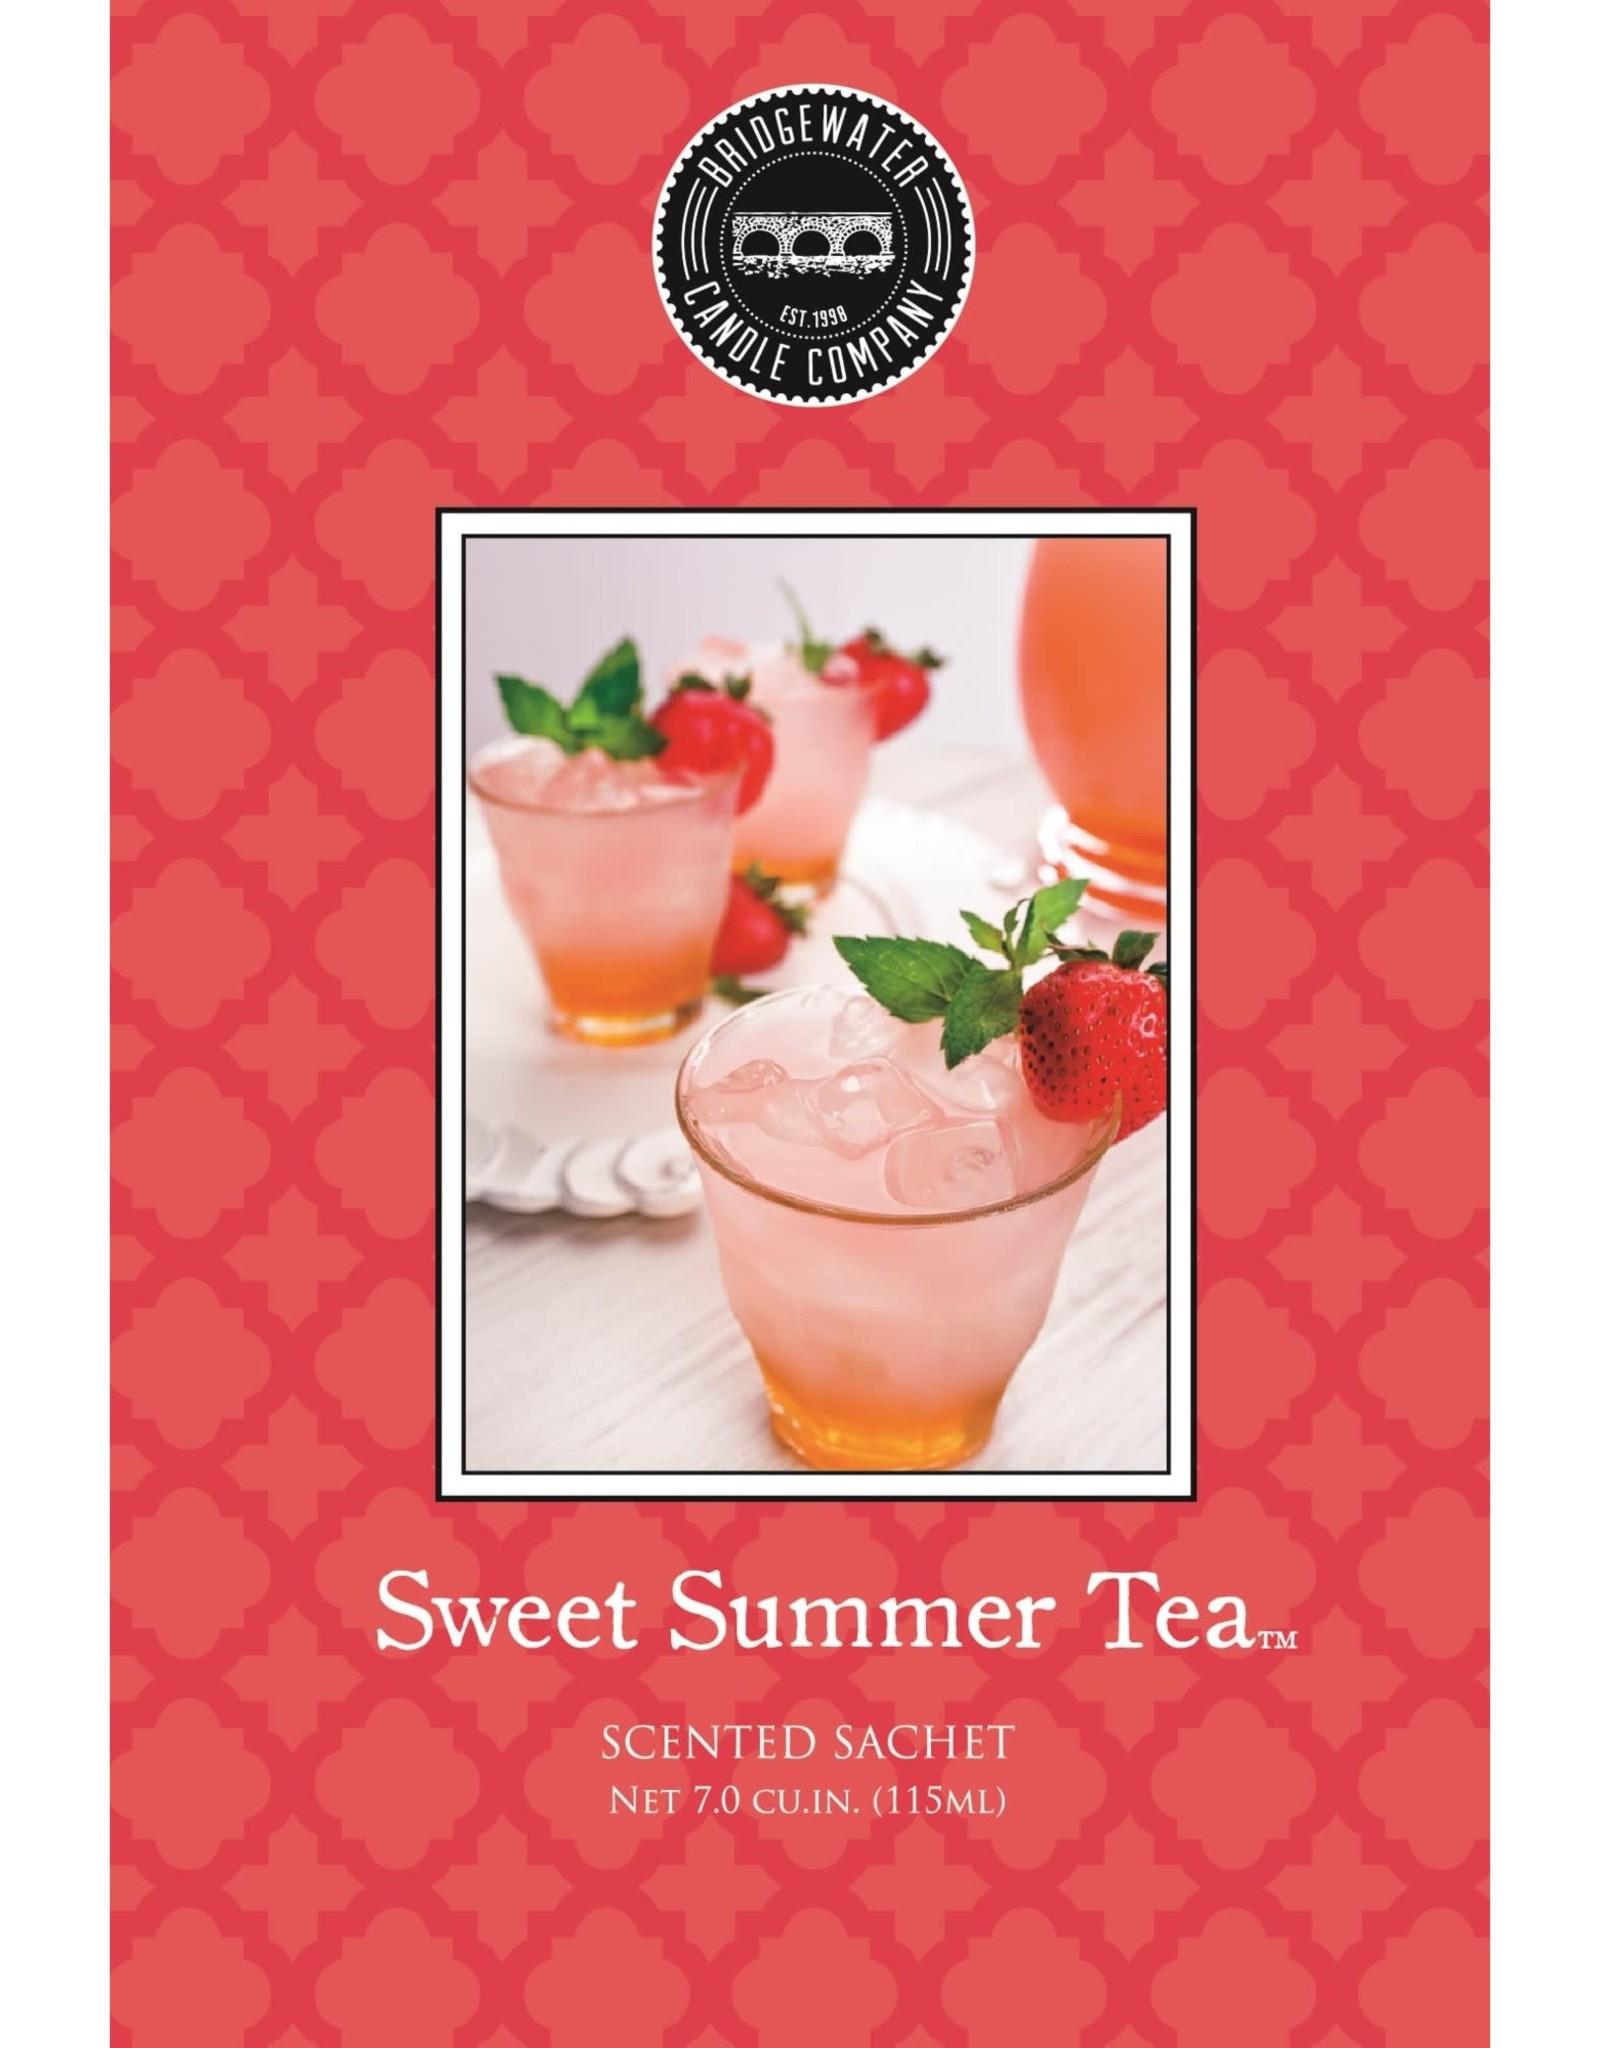 Parfum sweet summer tea